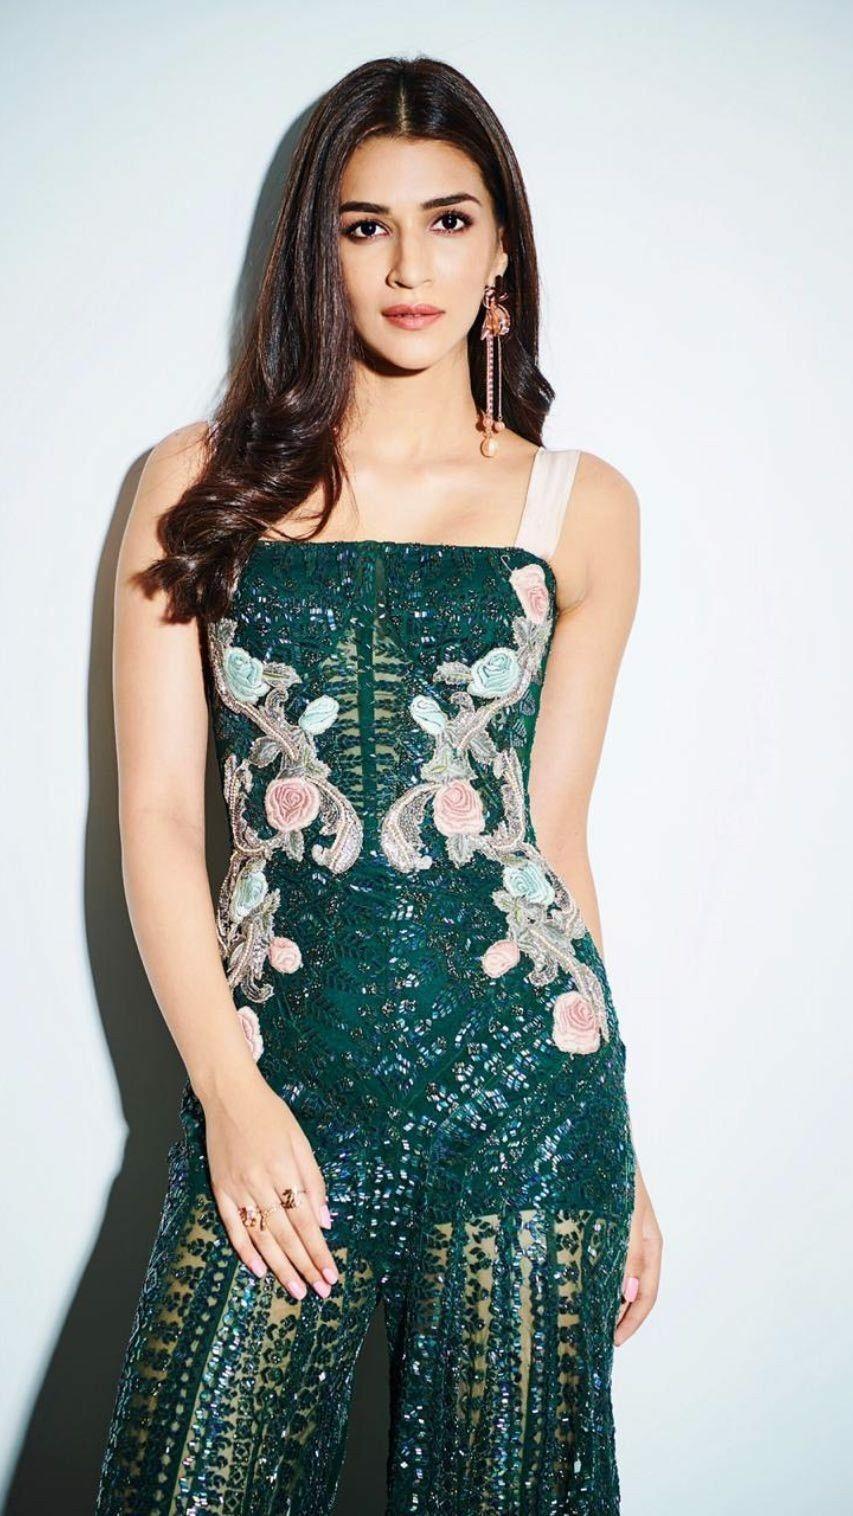 Kriti Sanon Movies, News, Songs & Images - Bollywood Hungama